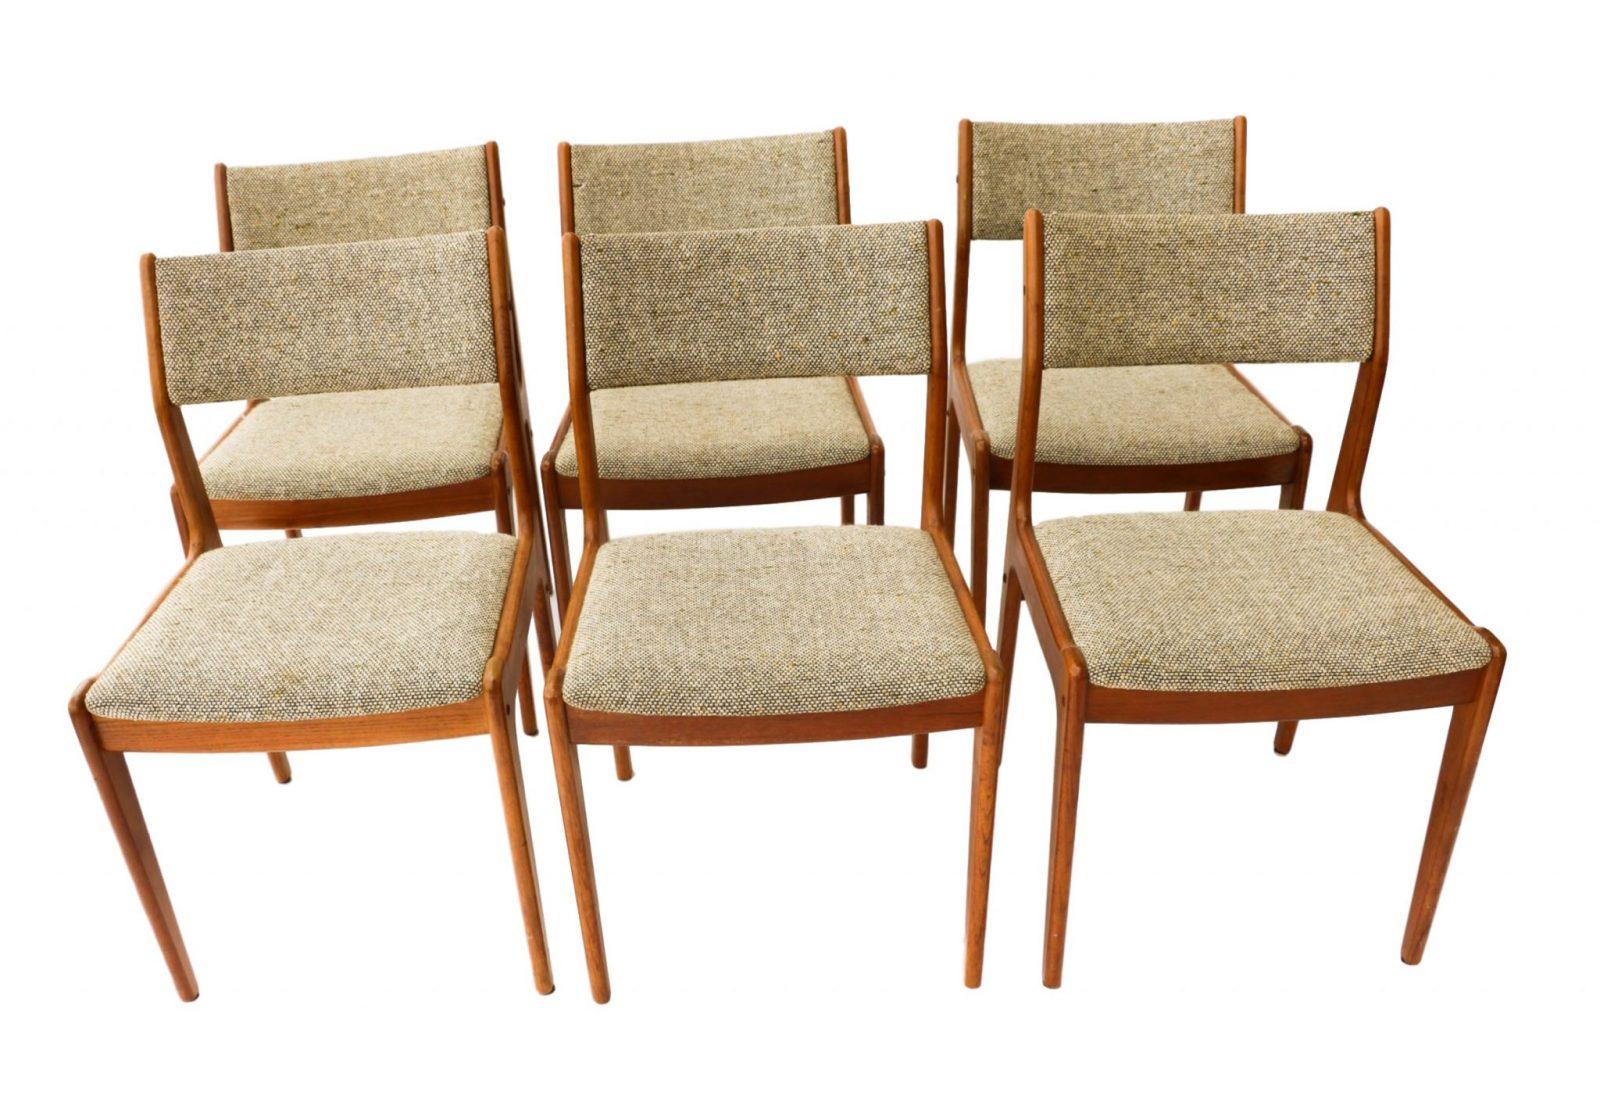 Gorgeous teak scandinavia danish modern dining chairs six - Scandinavian teak dining room furniture design ...